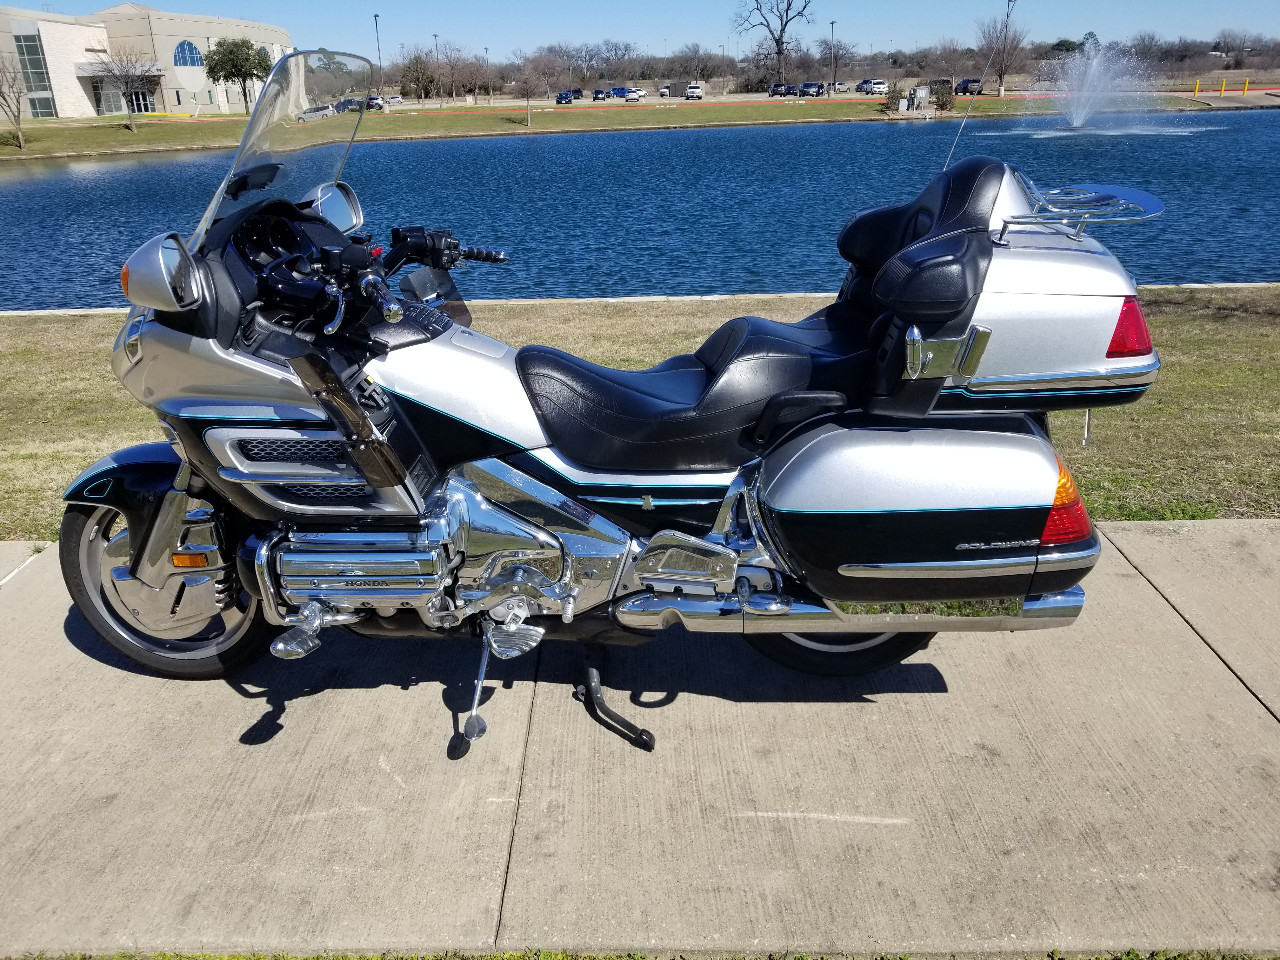 Used Honda For Sale - Honda YOUTH Motorcycles - Cycle Trader